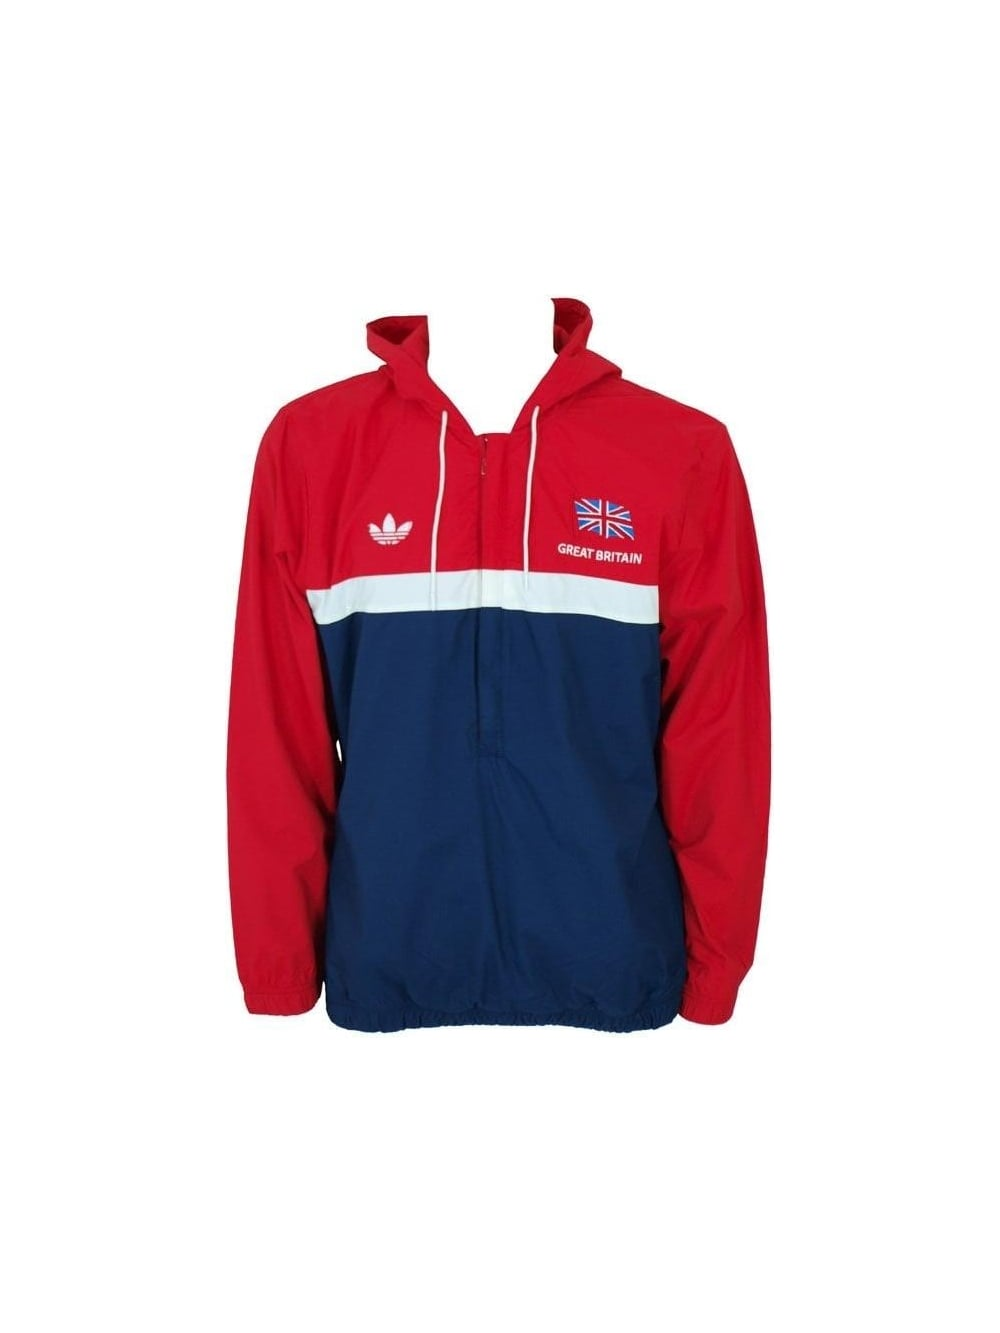 Mens Adidas Originals Team Gb Archive Track Jacket Red White Blue